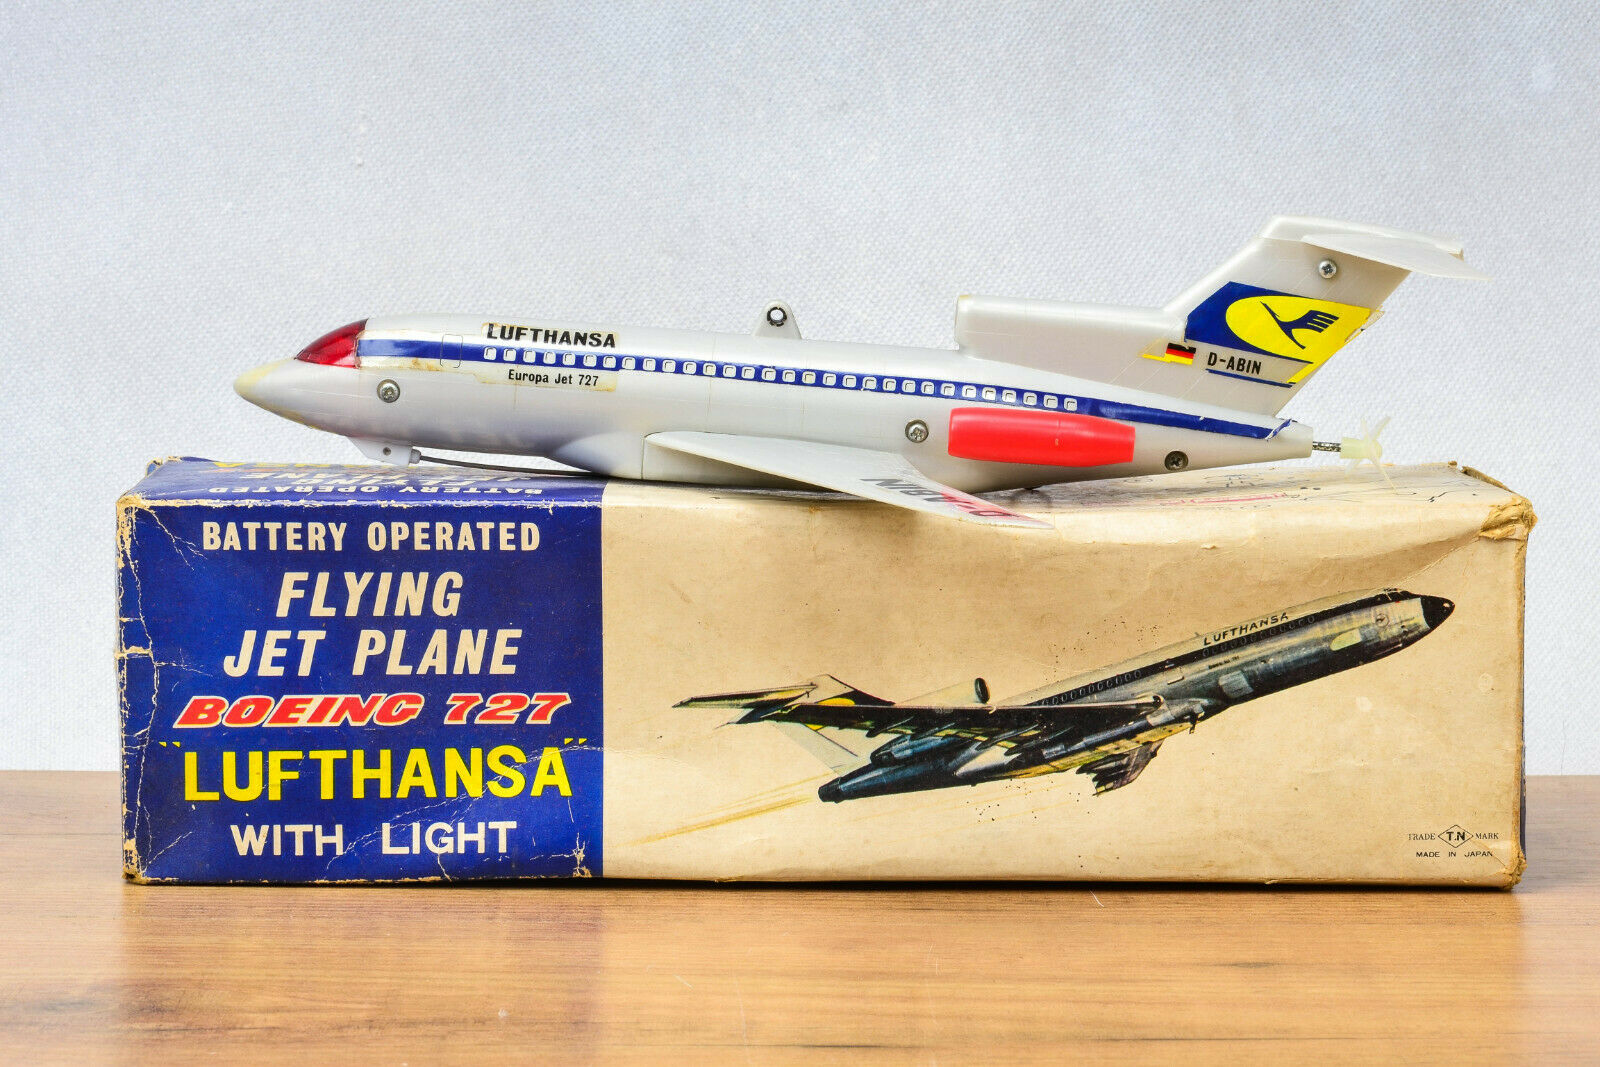 Antique Juguete De Plasti   Tn Nomura Boeing 727 Lufthansa avión avión jet de vuelo